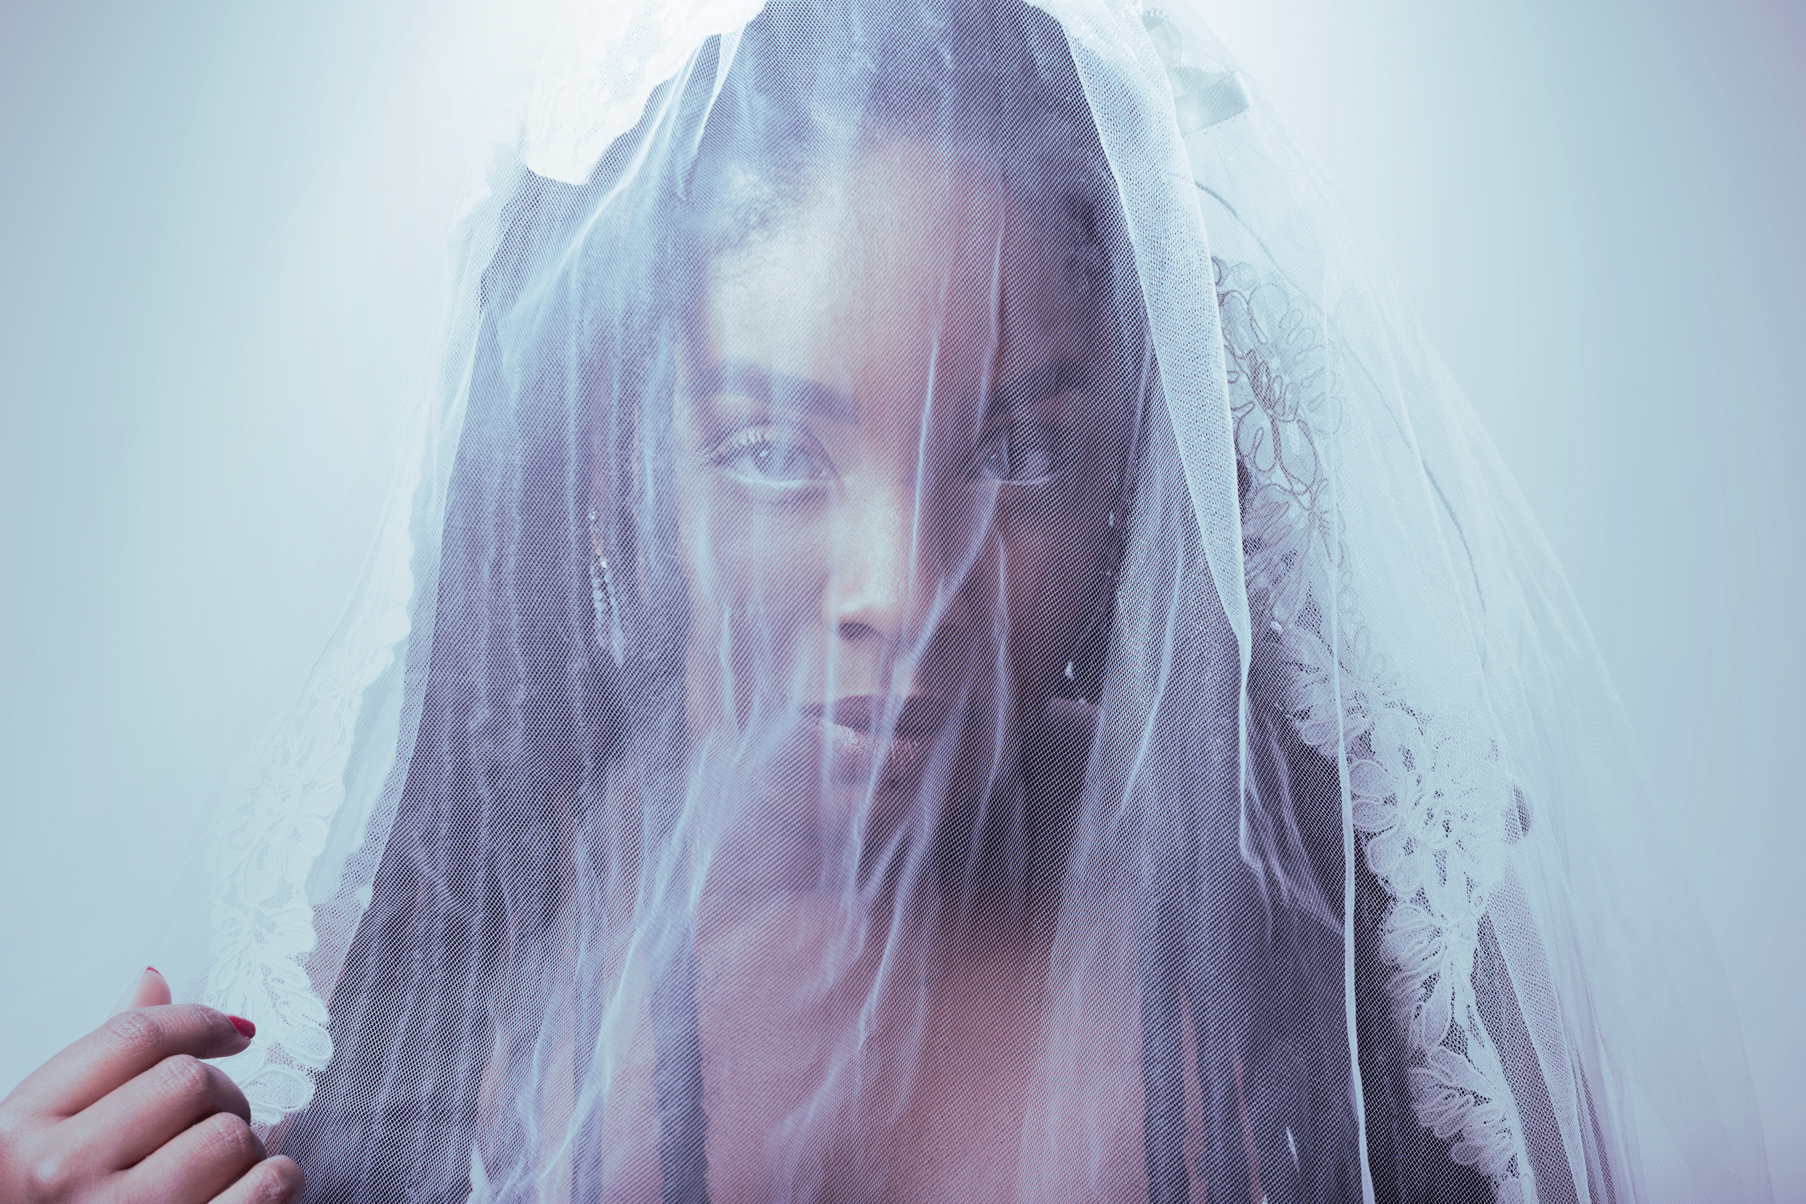 veil-chamber-photography-photo-shoot-antoine-hart.jpg